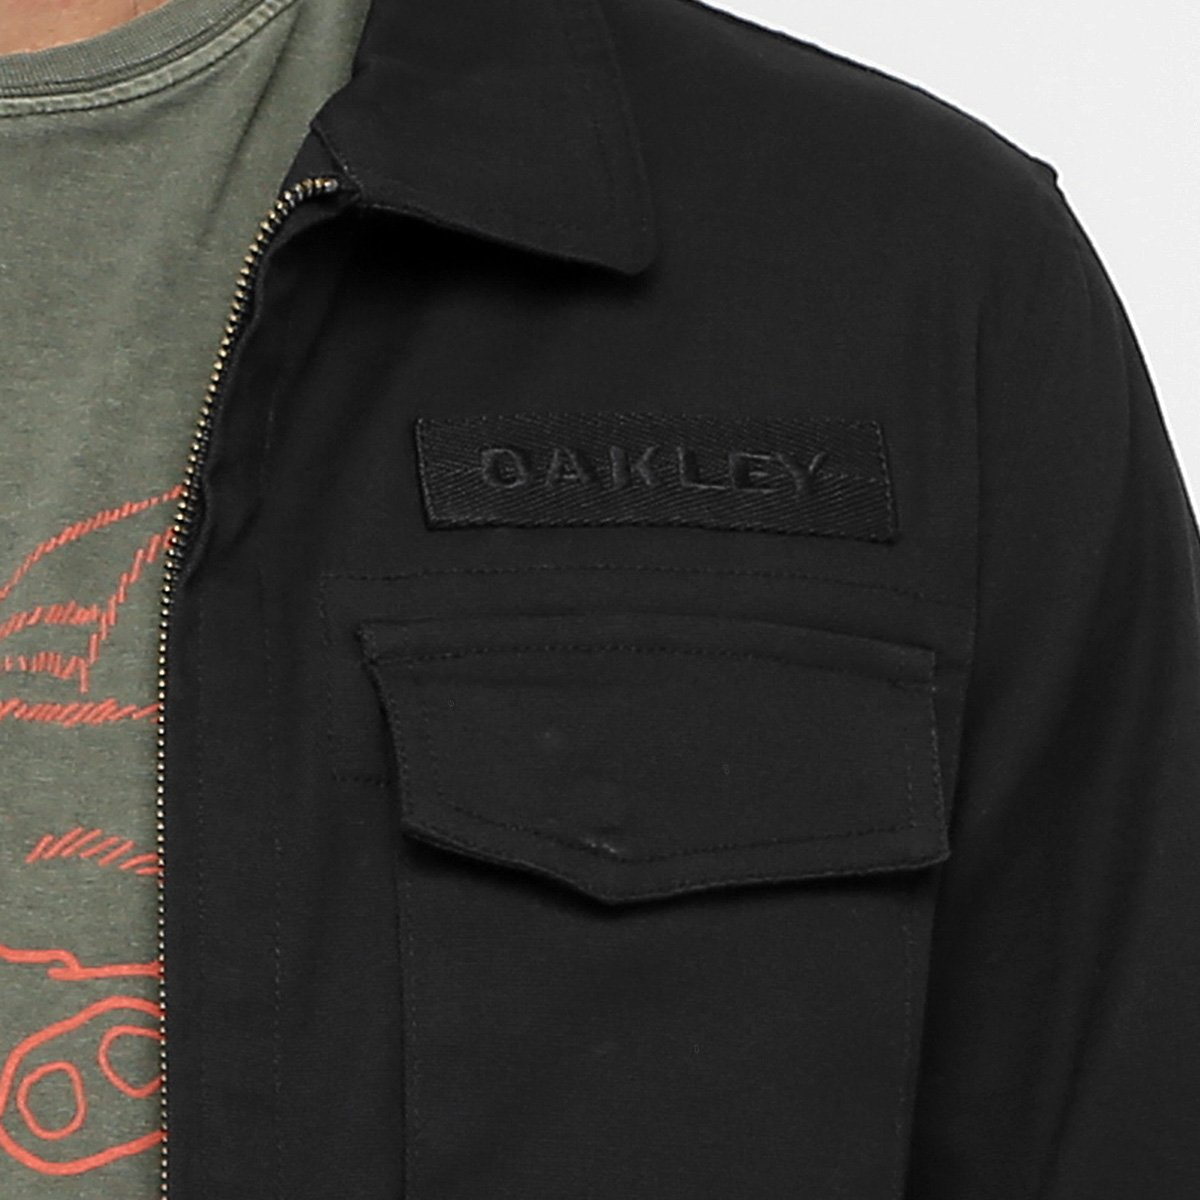 Jaqueta Oakley Sergeant Masculina - Compre Agora   Netshoes 35def02499